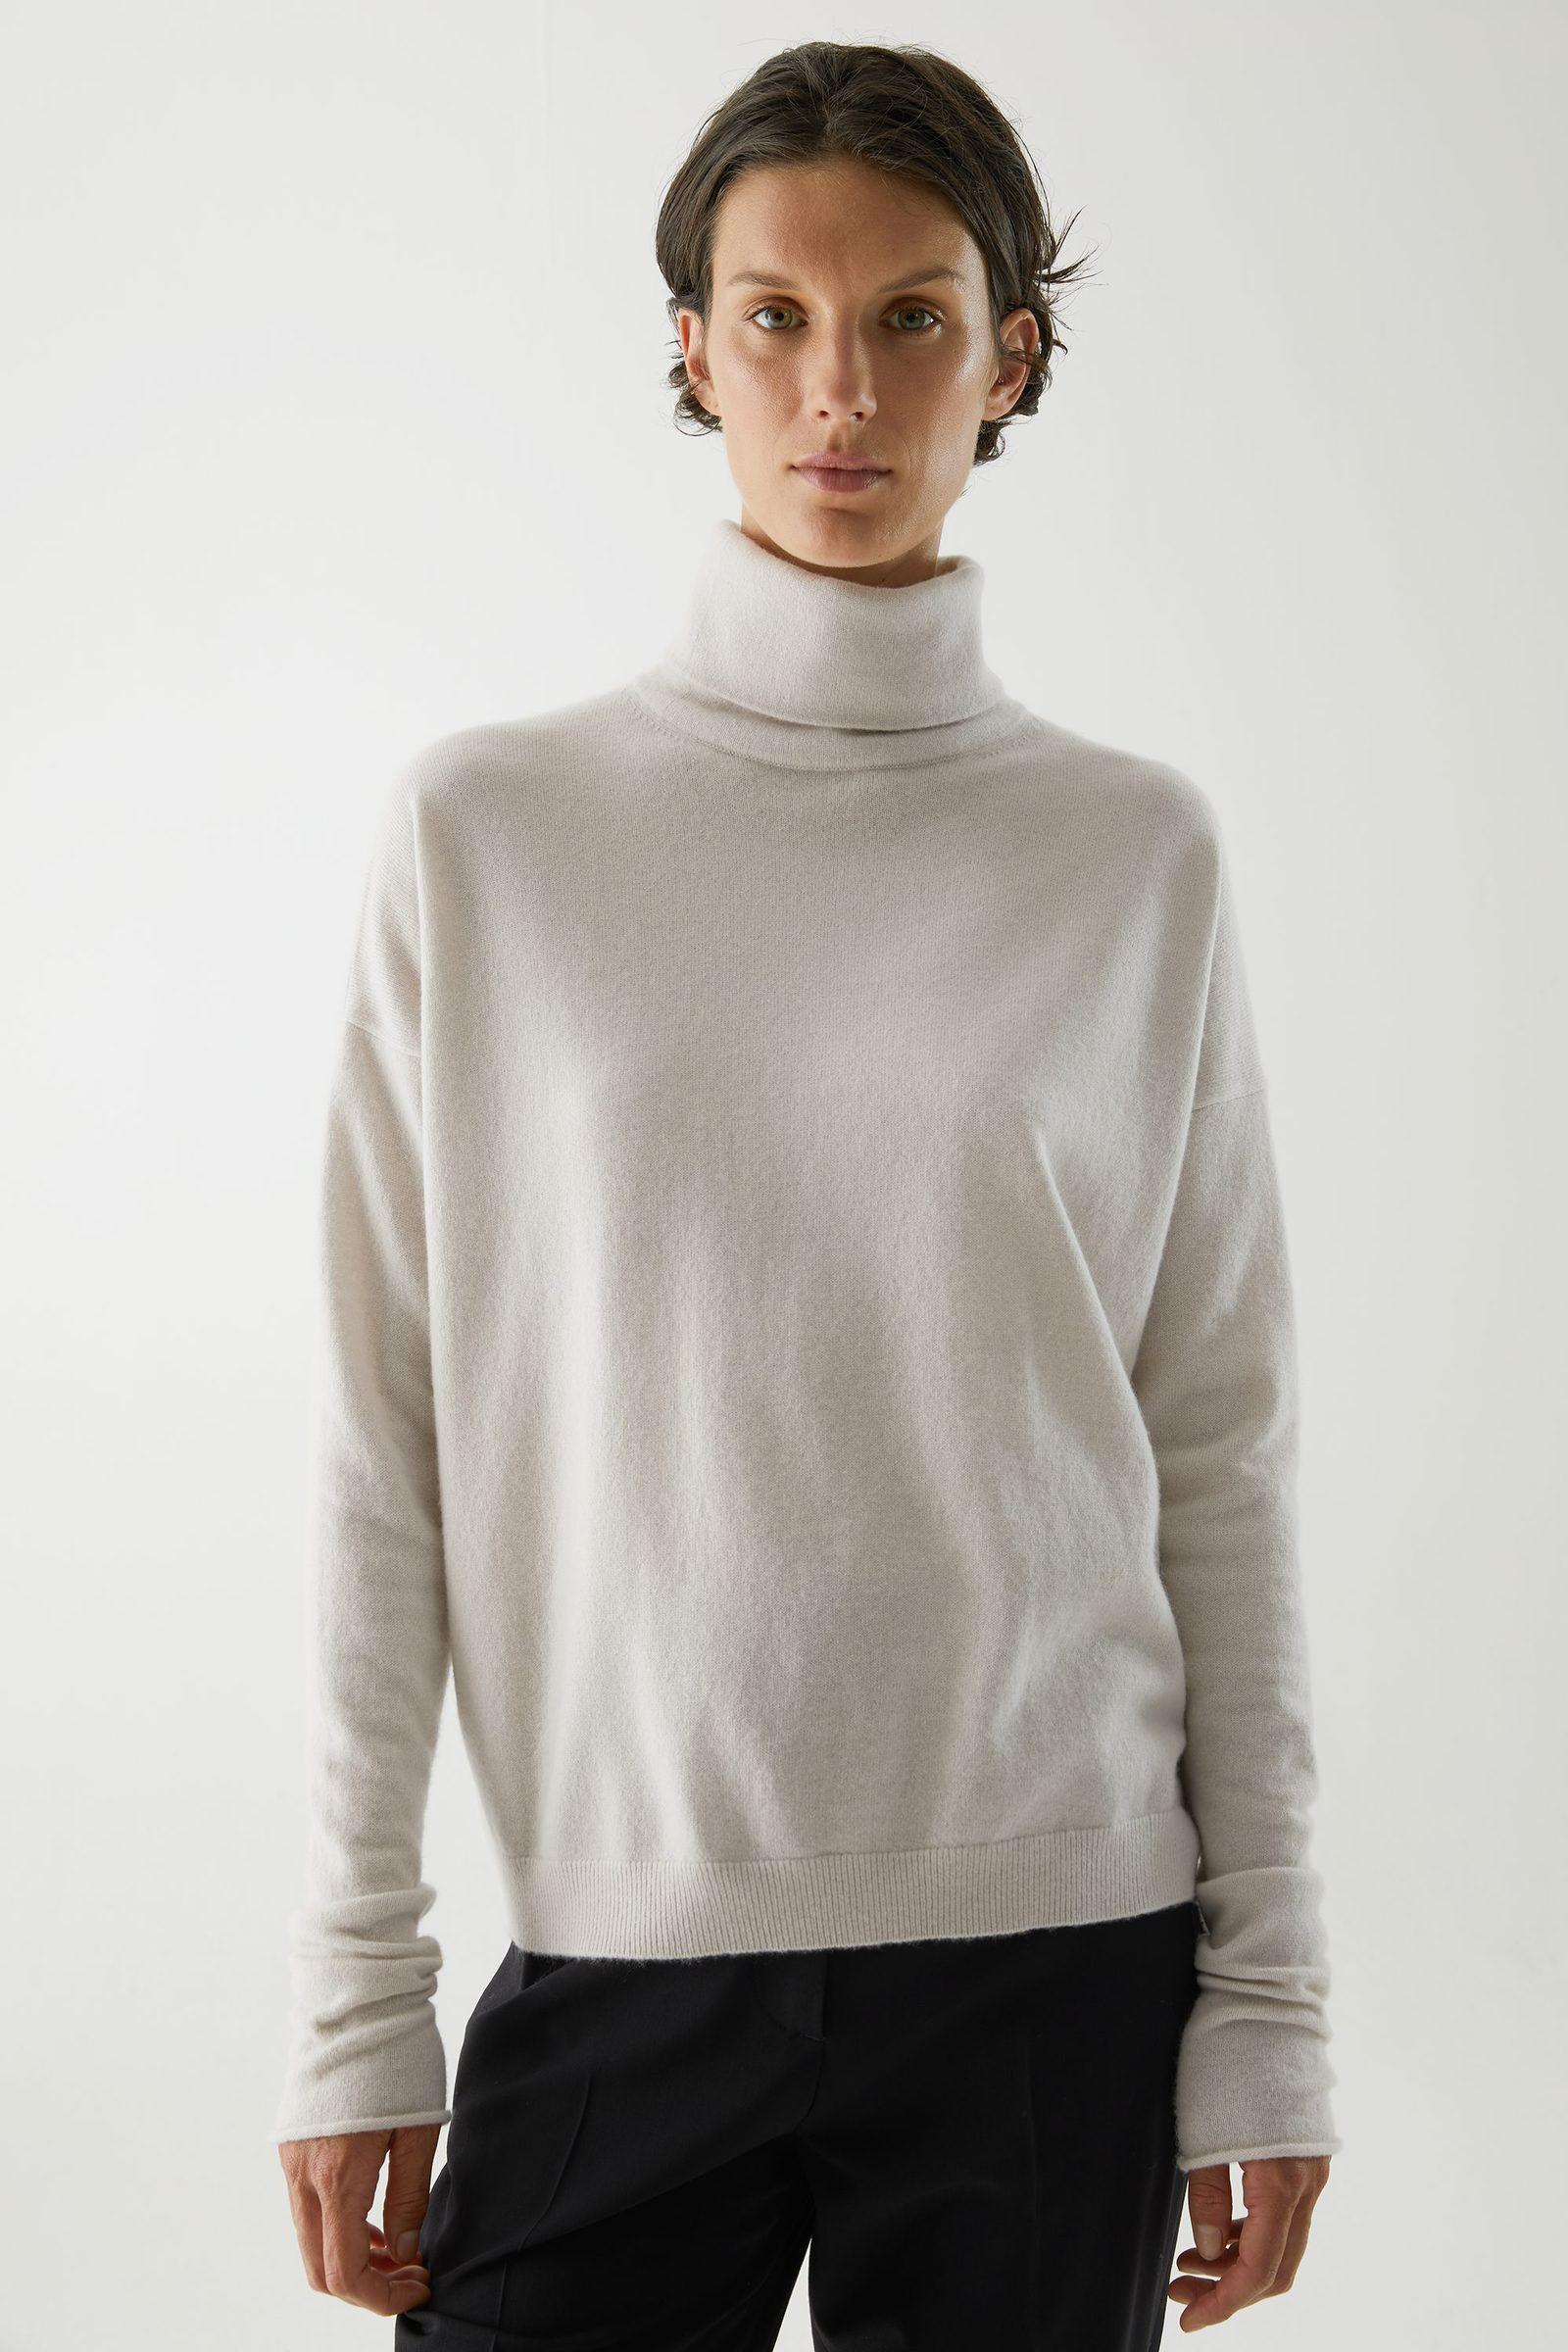 COS 롤넥 캐시미어 스웨터의 라이트 베이지컬러 ECOMLook입니다.